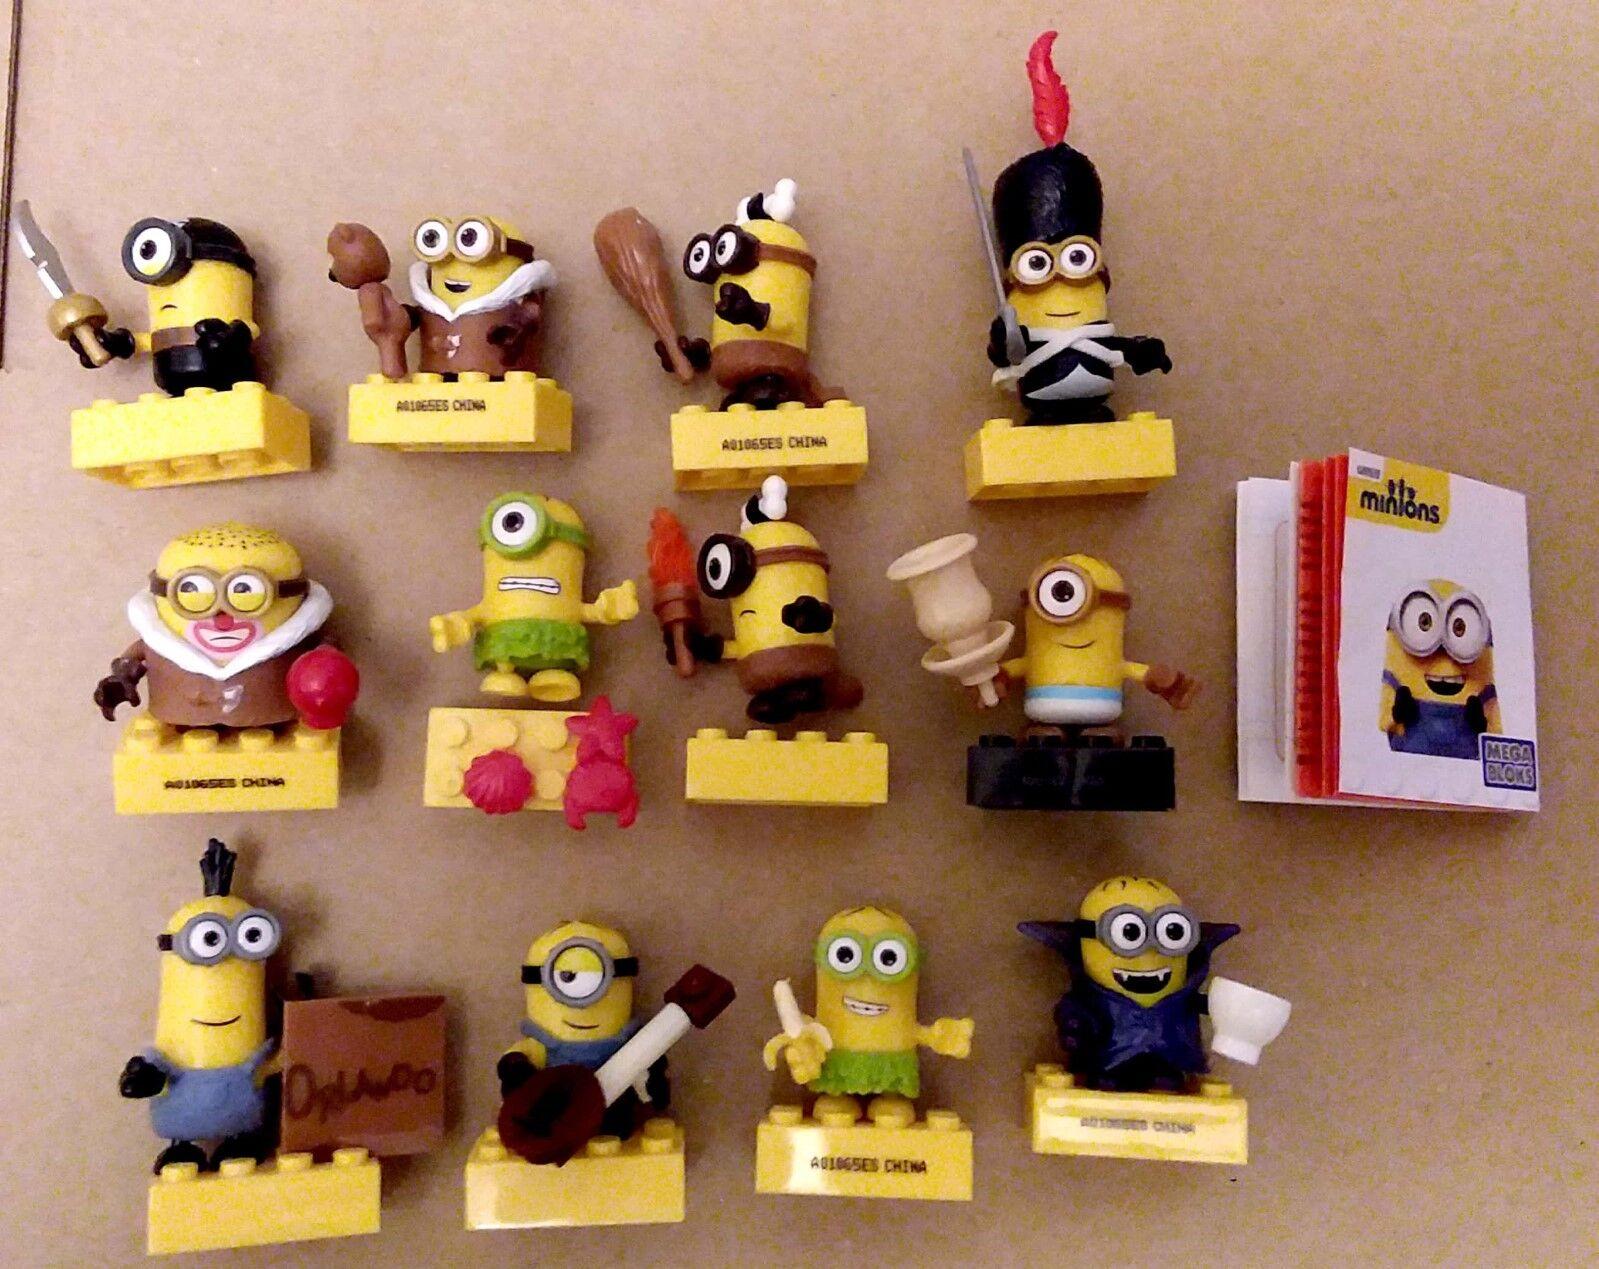 Mega Bloks Minions Mini figures series 3 complete set of 12 - inc Ultra Rares